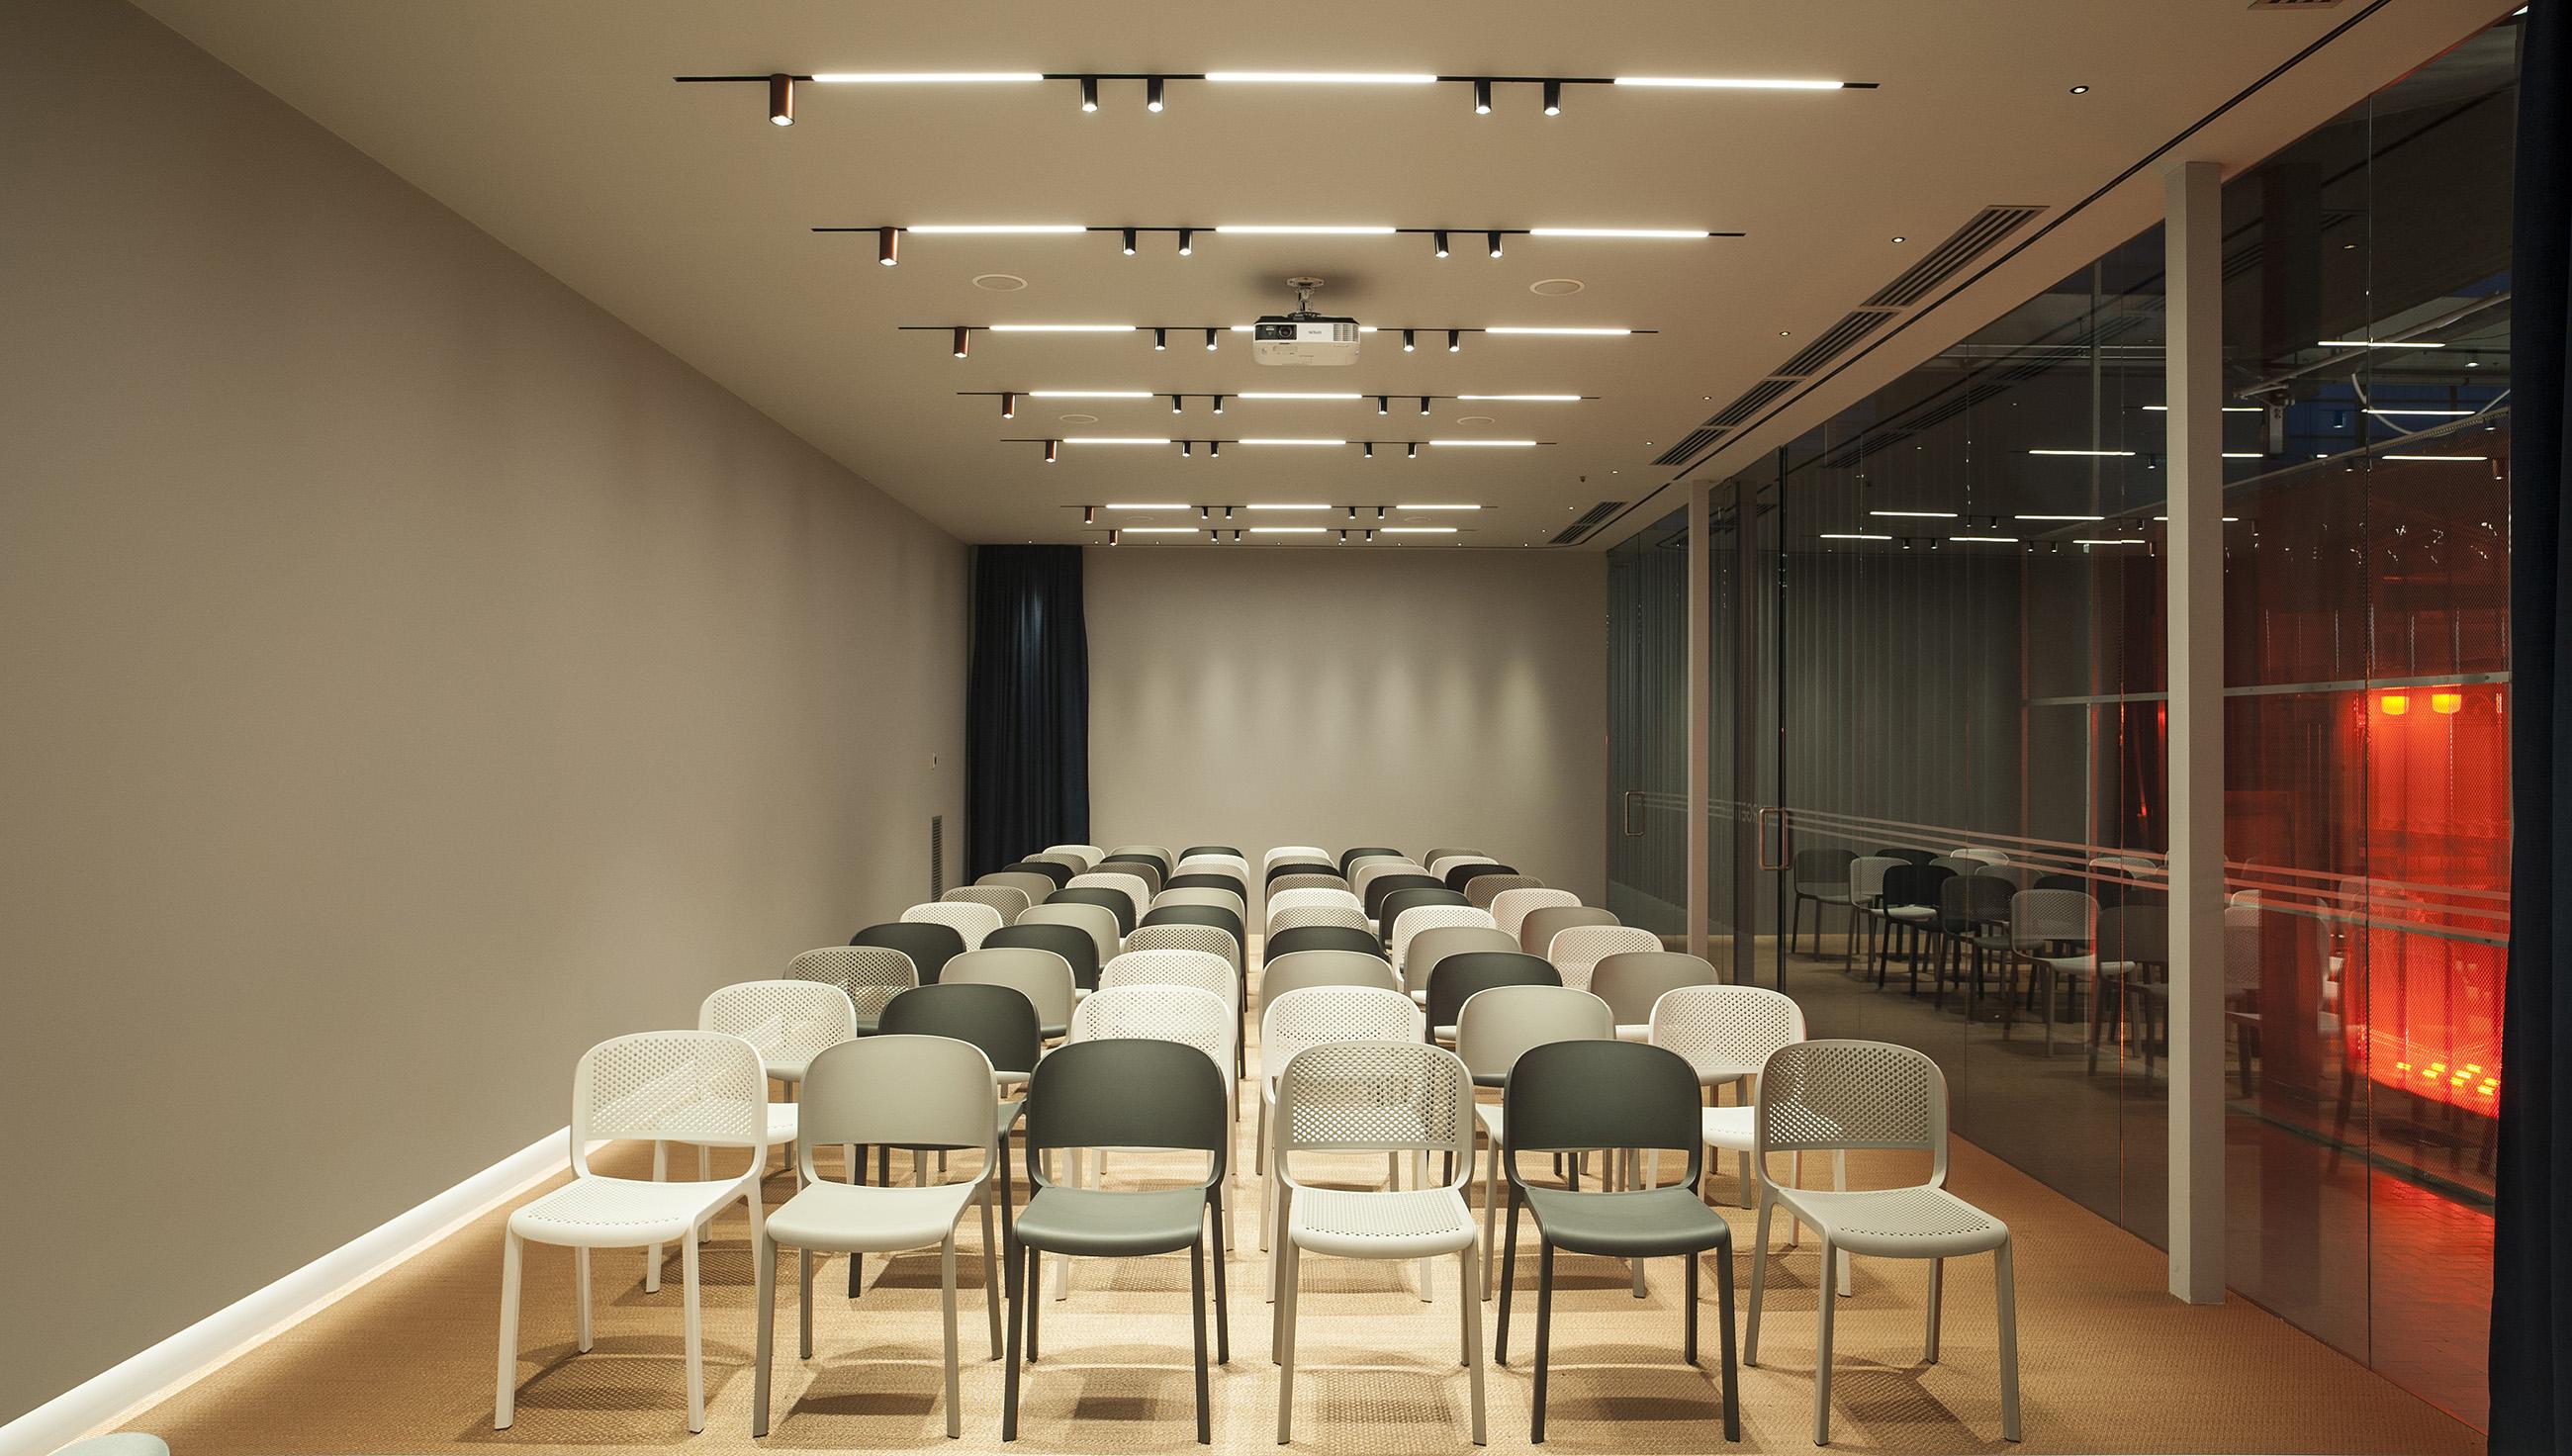 Th01, Targetti, HUB, Firenze, Florence, showroom, Deferrari Modesti